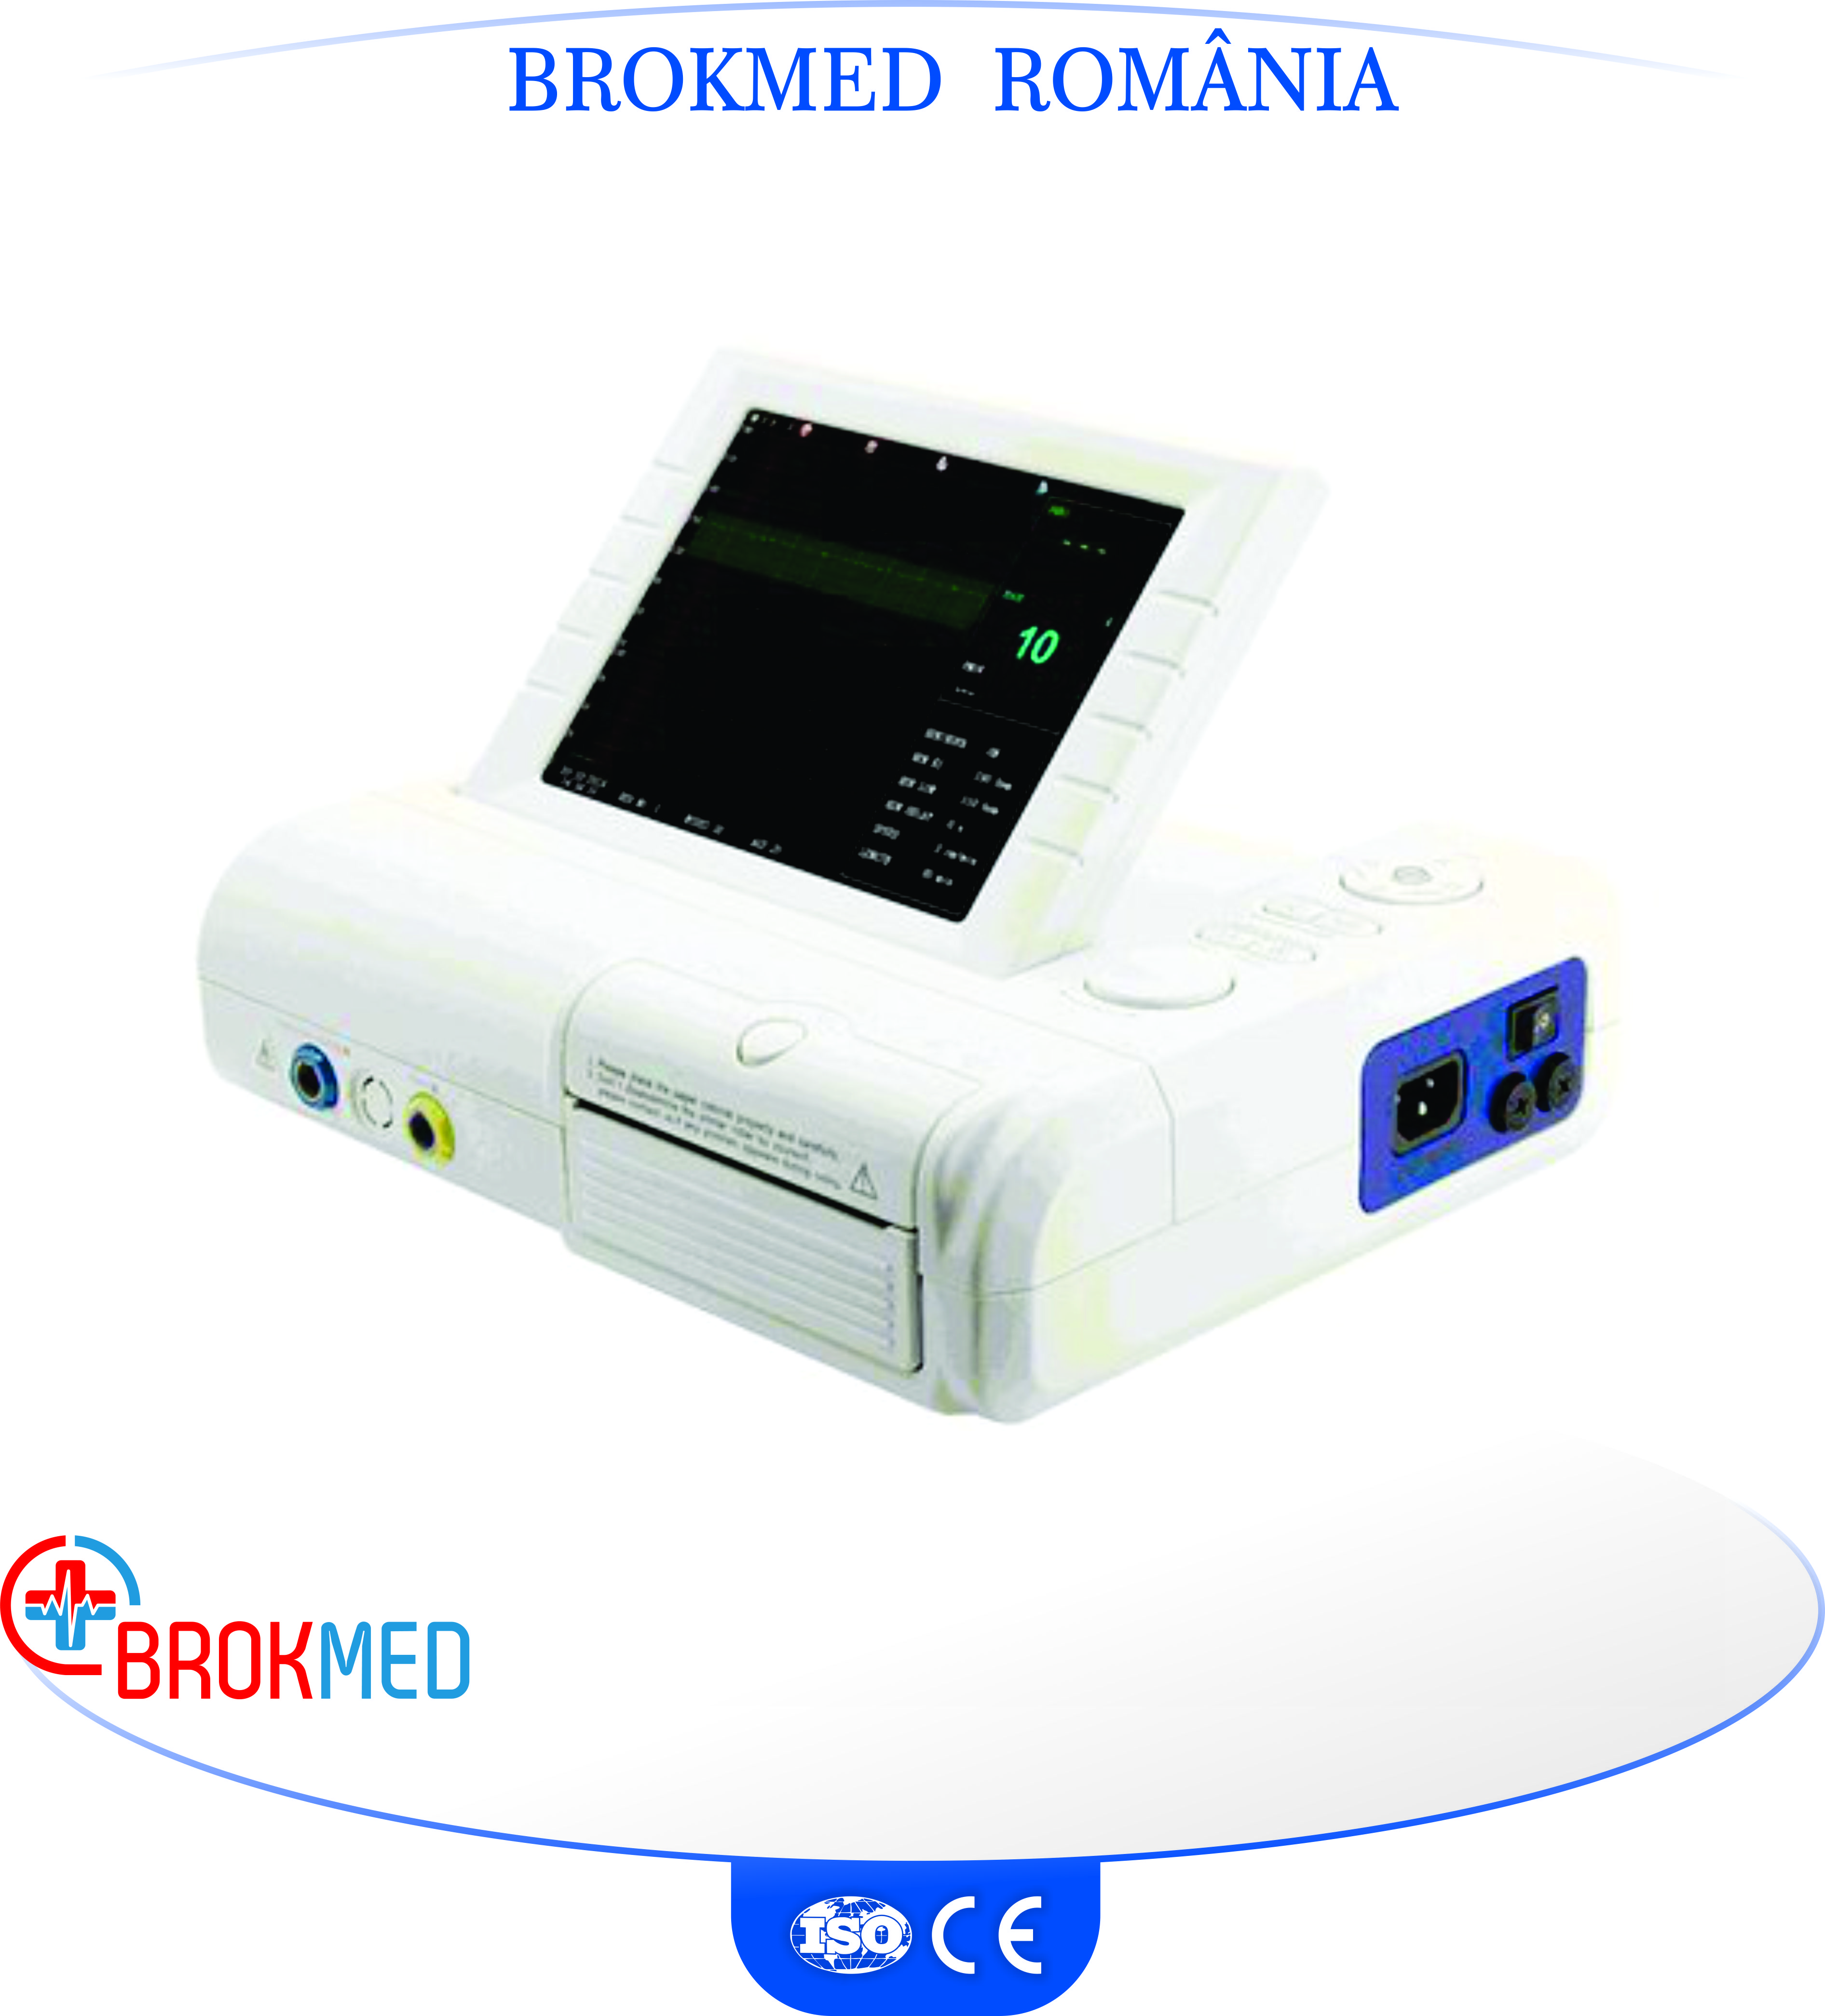 Monitor fetal 800G